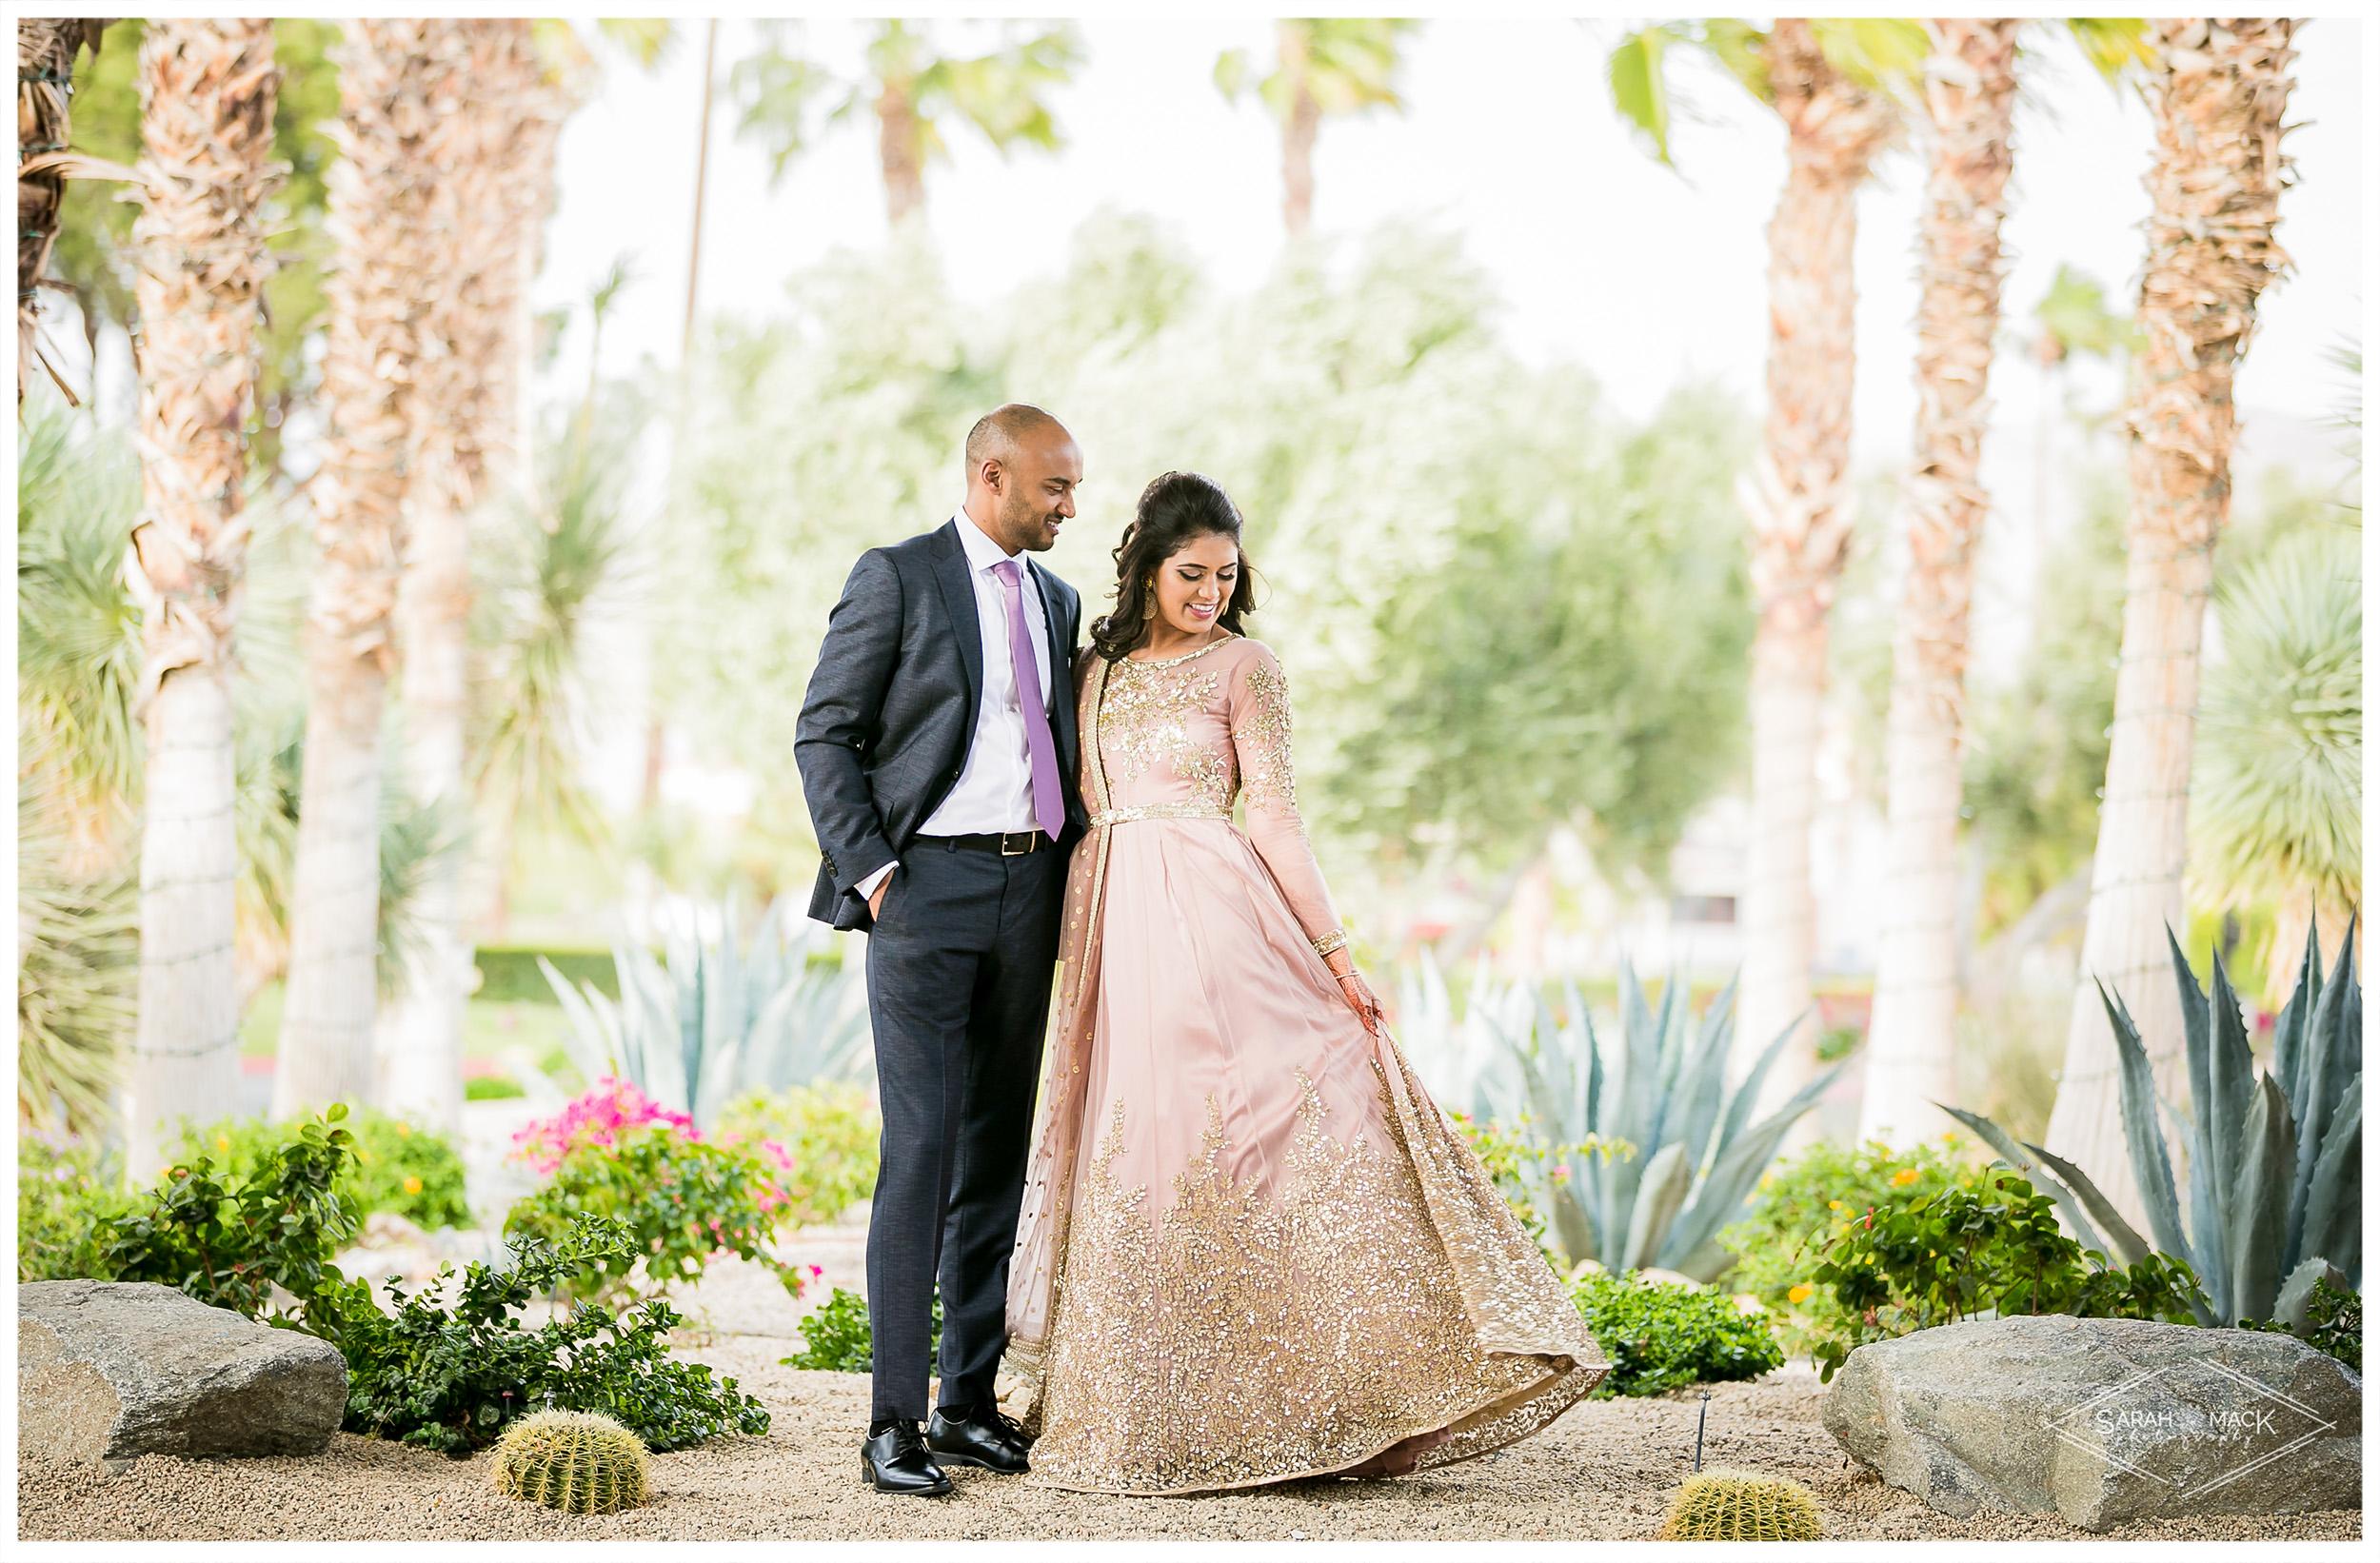 PR-Double-Tree-Hilton-Palm-Springs-Indian-Wedding-2.jpg